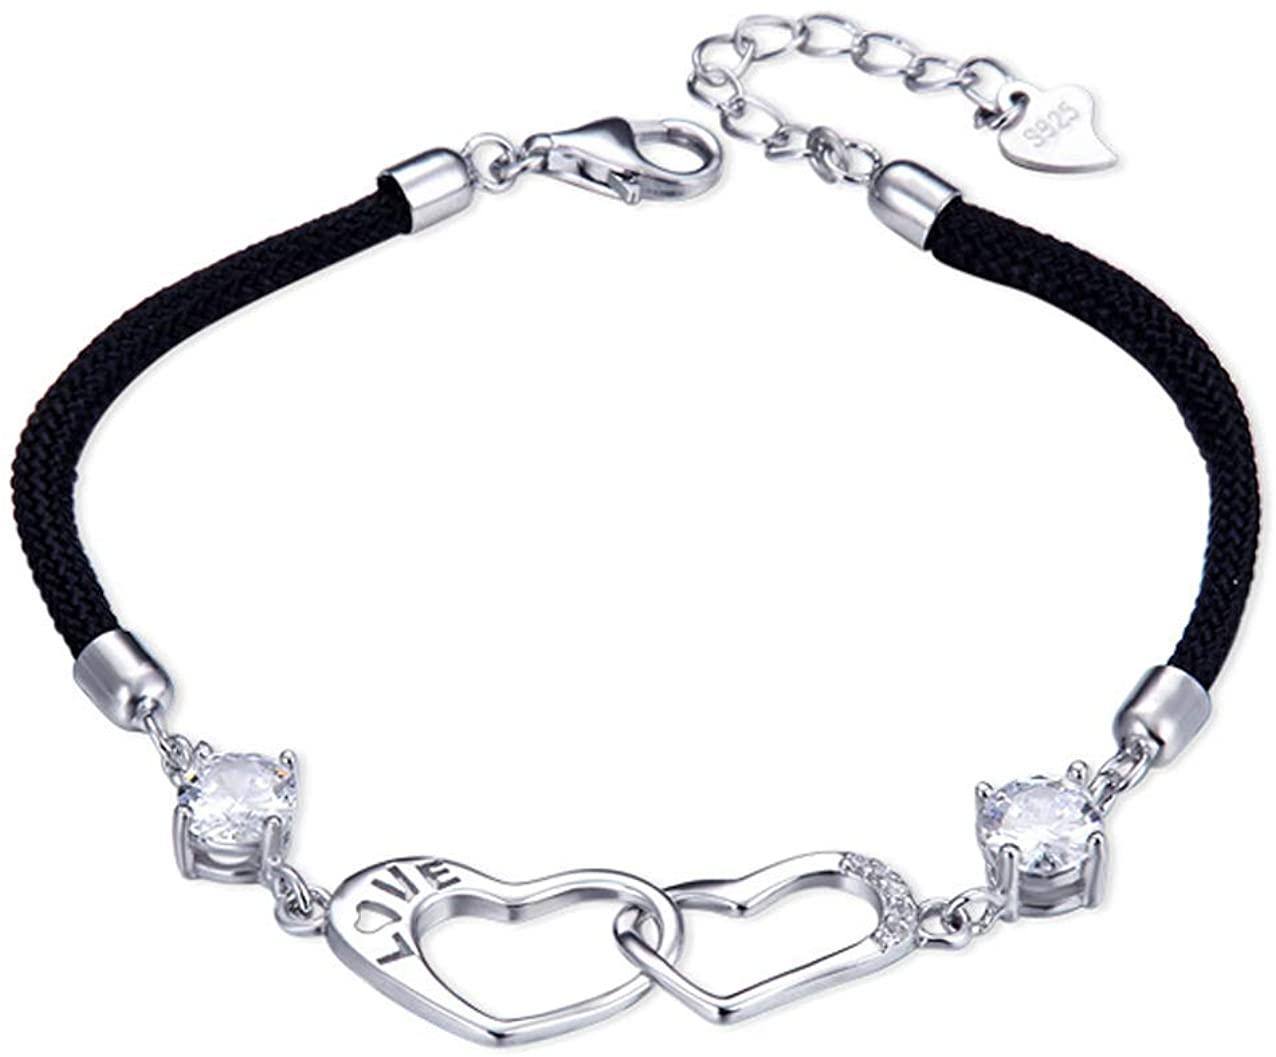 Bracelet for women, SUNCHIO 925 Sterling Silver Double Heart Women Fashion Bracelet, Woven Adjustable Charm Bridesmaid Bracelet, Couple Bracelet, Girl's Sterling Silver Bracelet